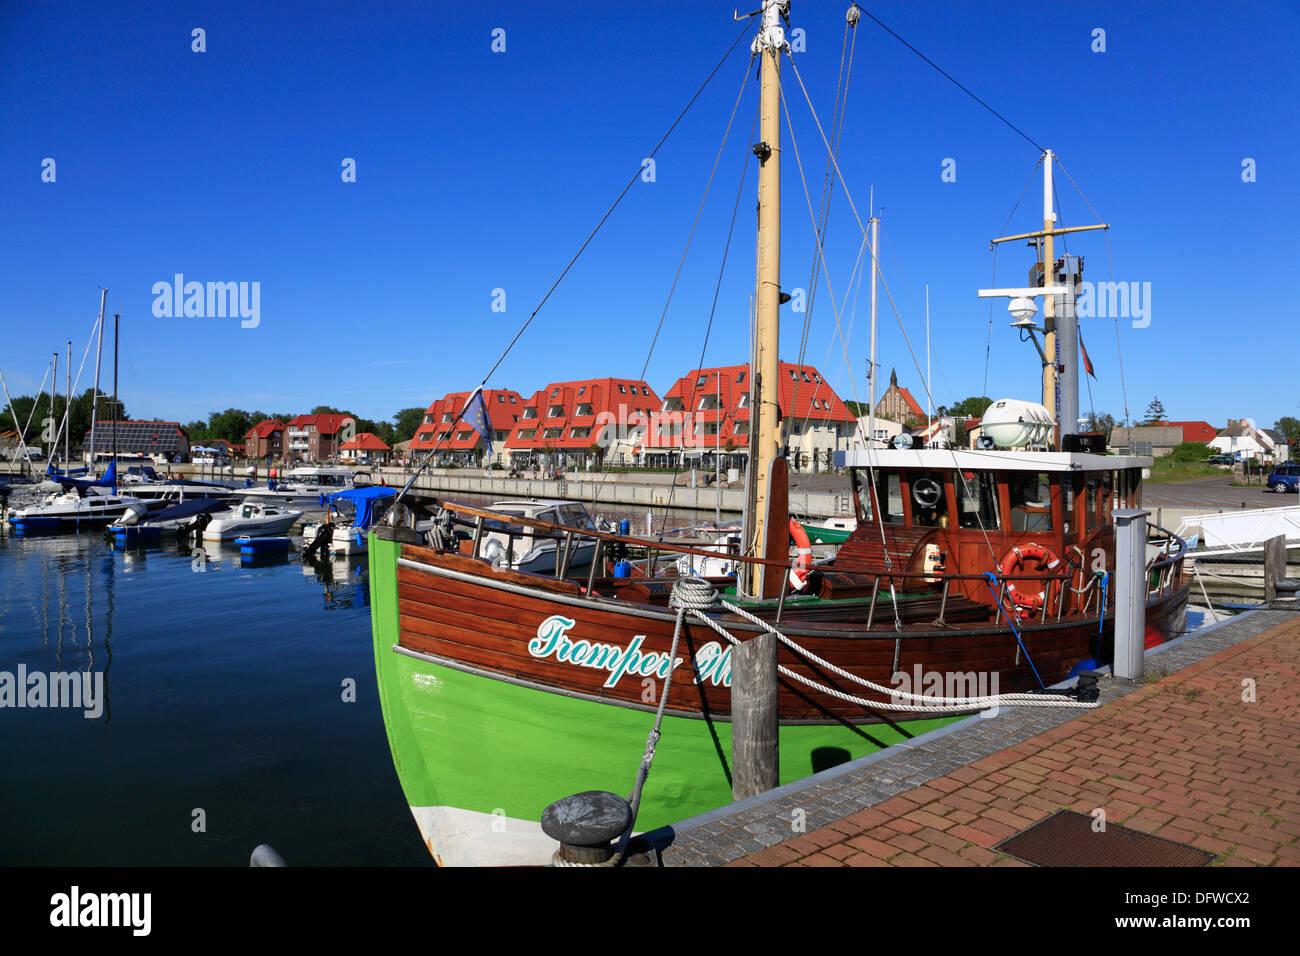 Trawler at  Wiek harbour, Ruegen Island, Baltic Sea Coast, Mecklenburg-Western Pomerania, Germany - Stock Image